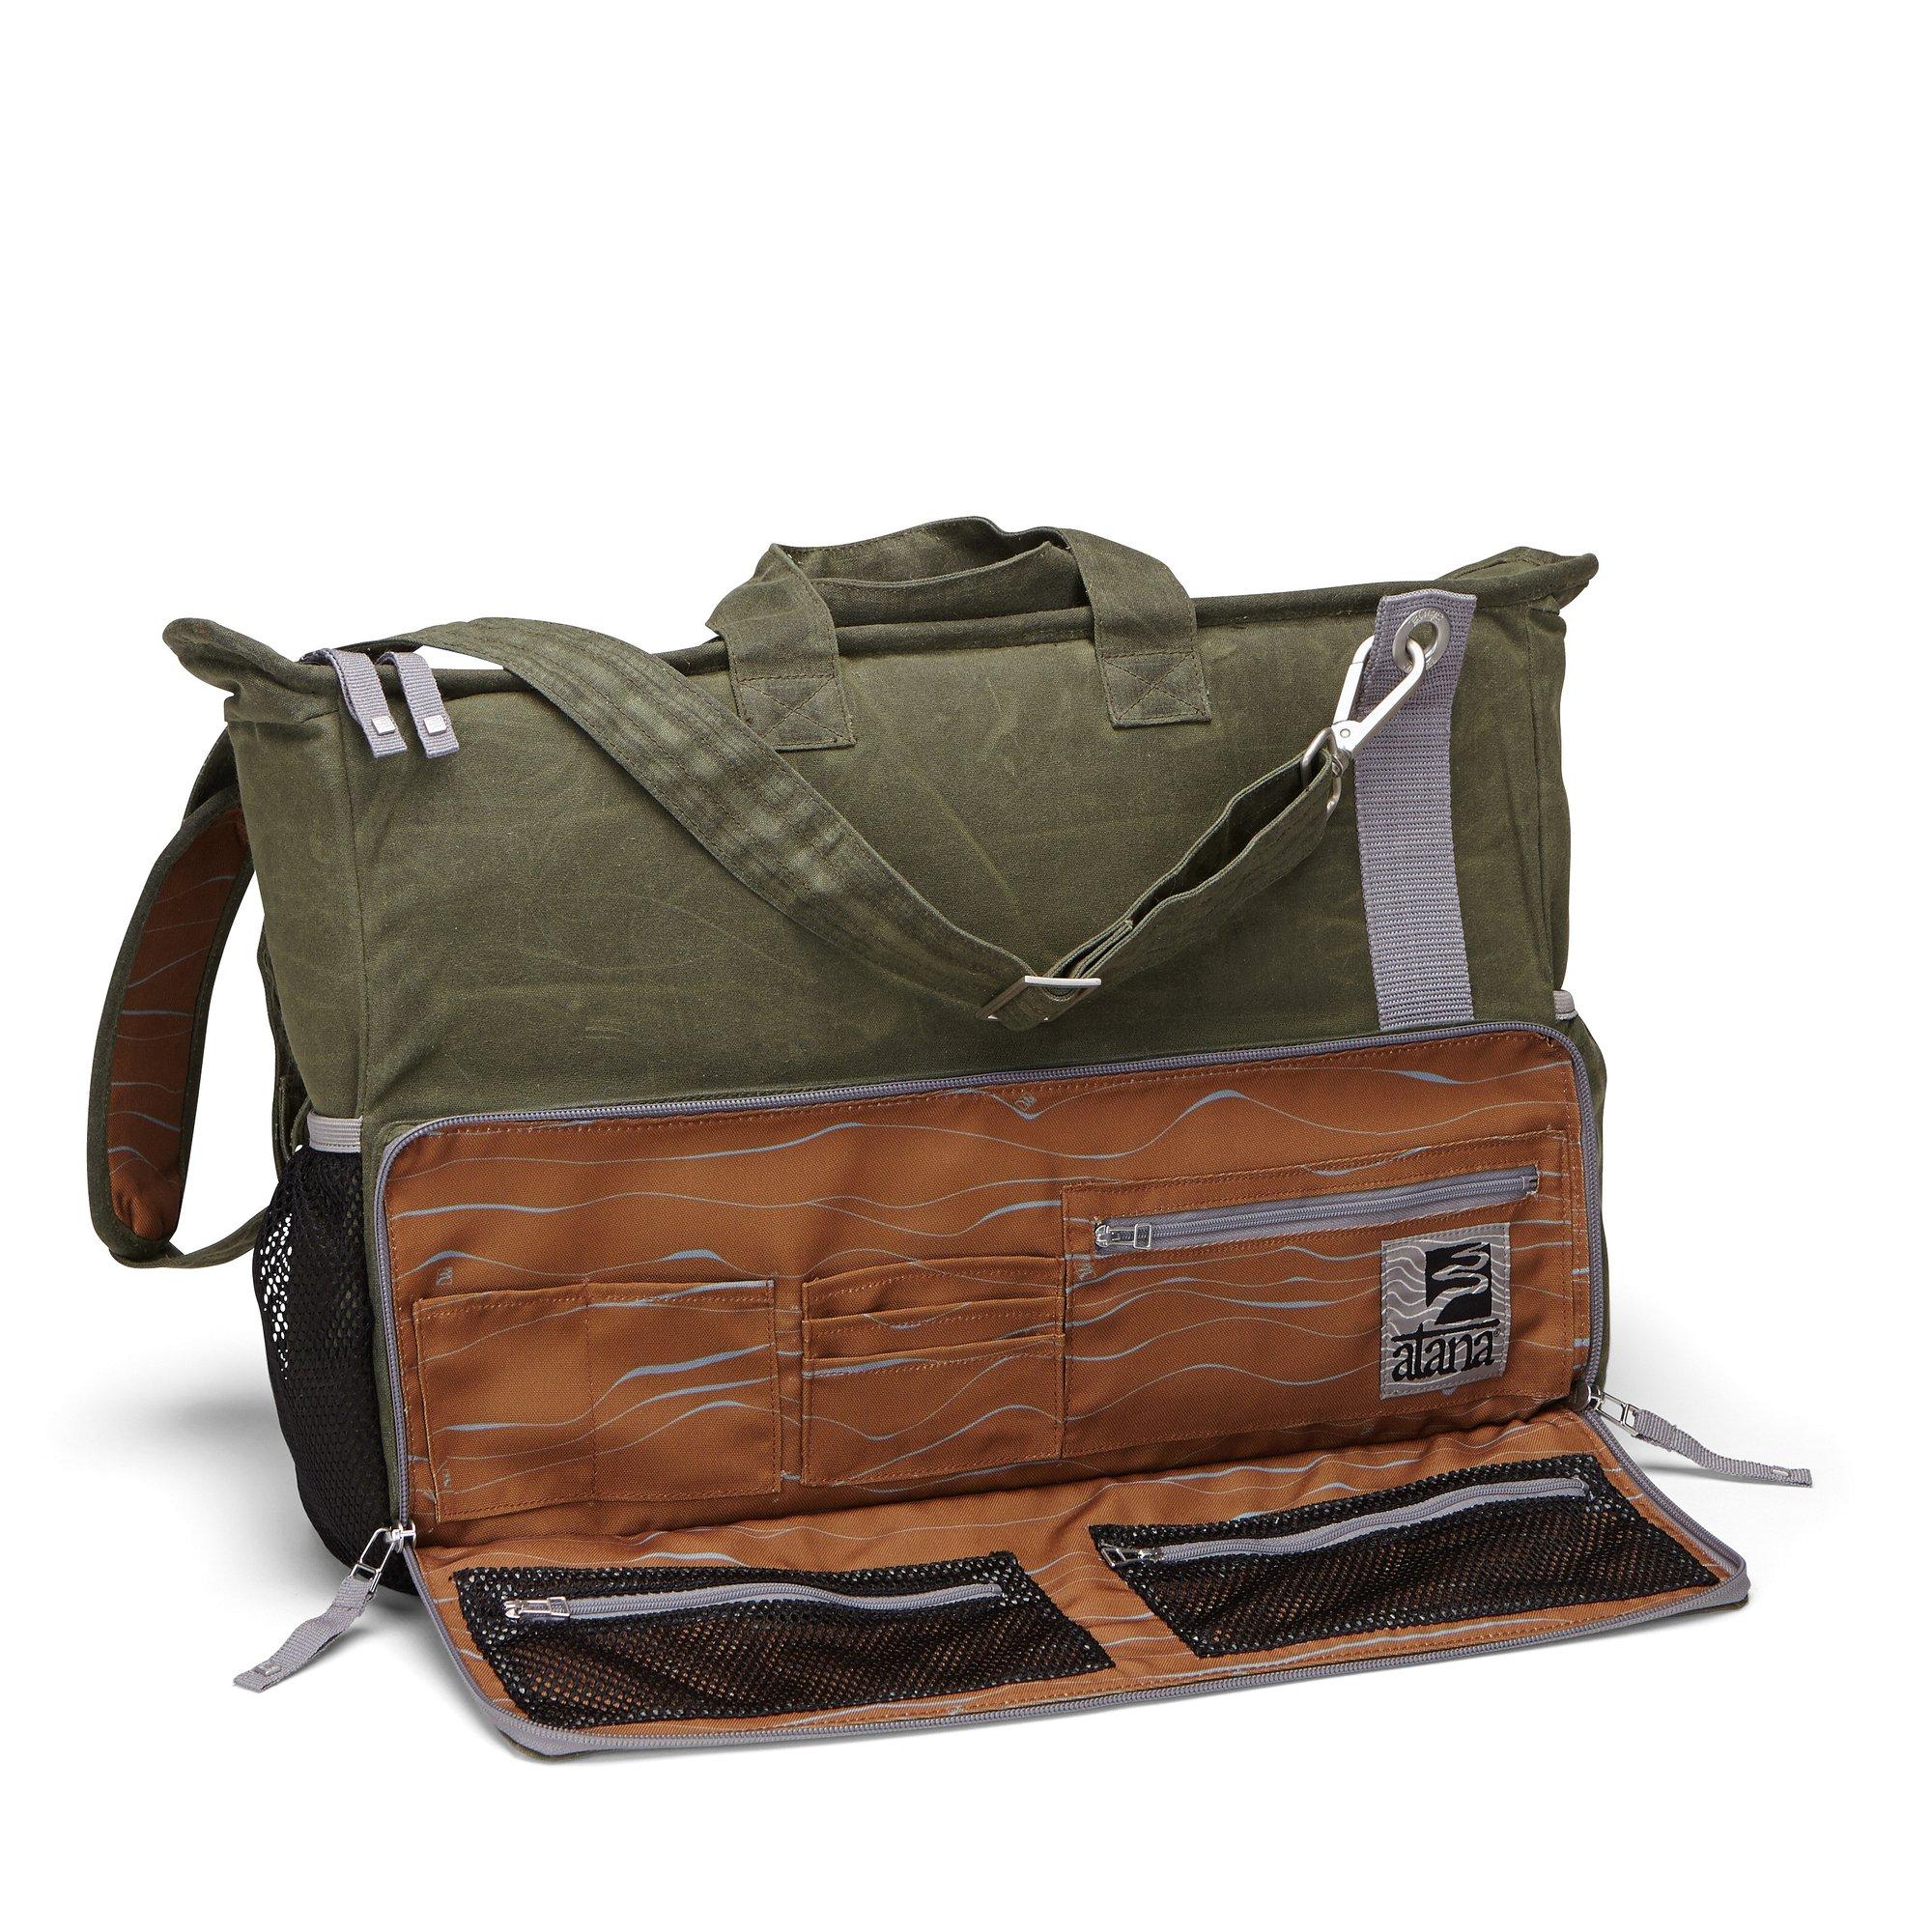 good quality temperament shoes best price Best Daypacks for Travel - 8 Top Travel Daypacks — ReddyYeti